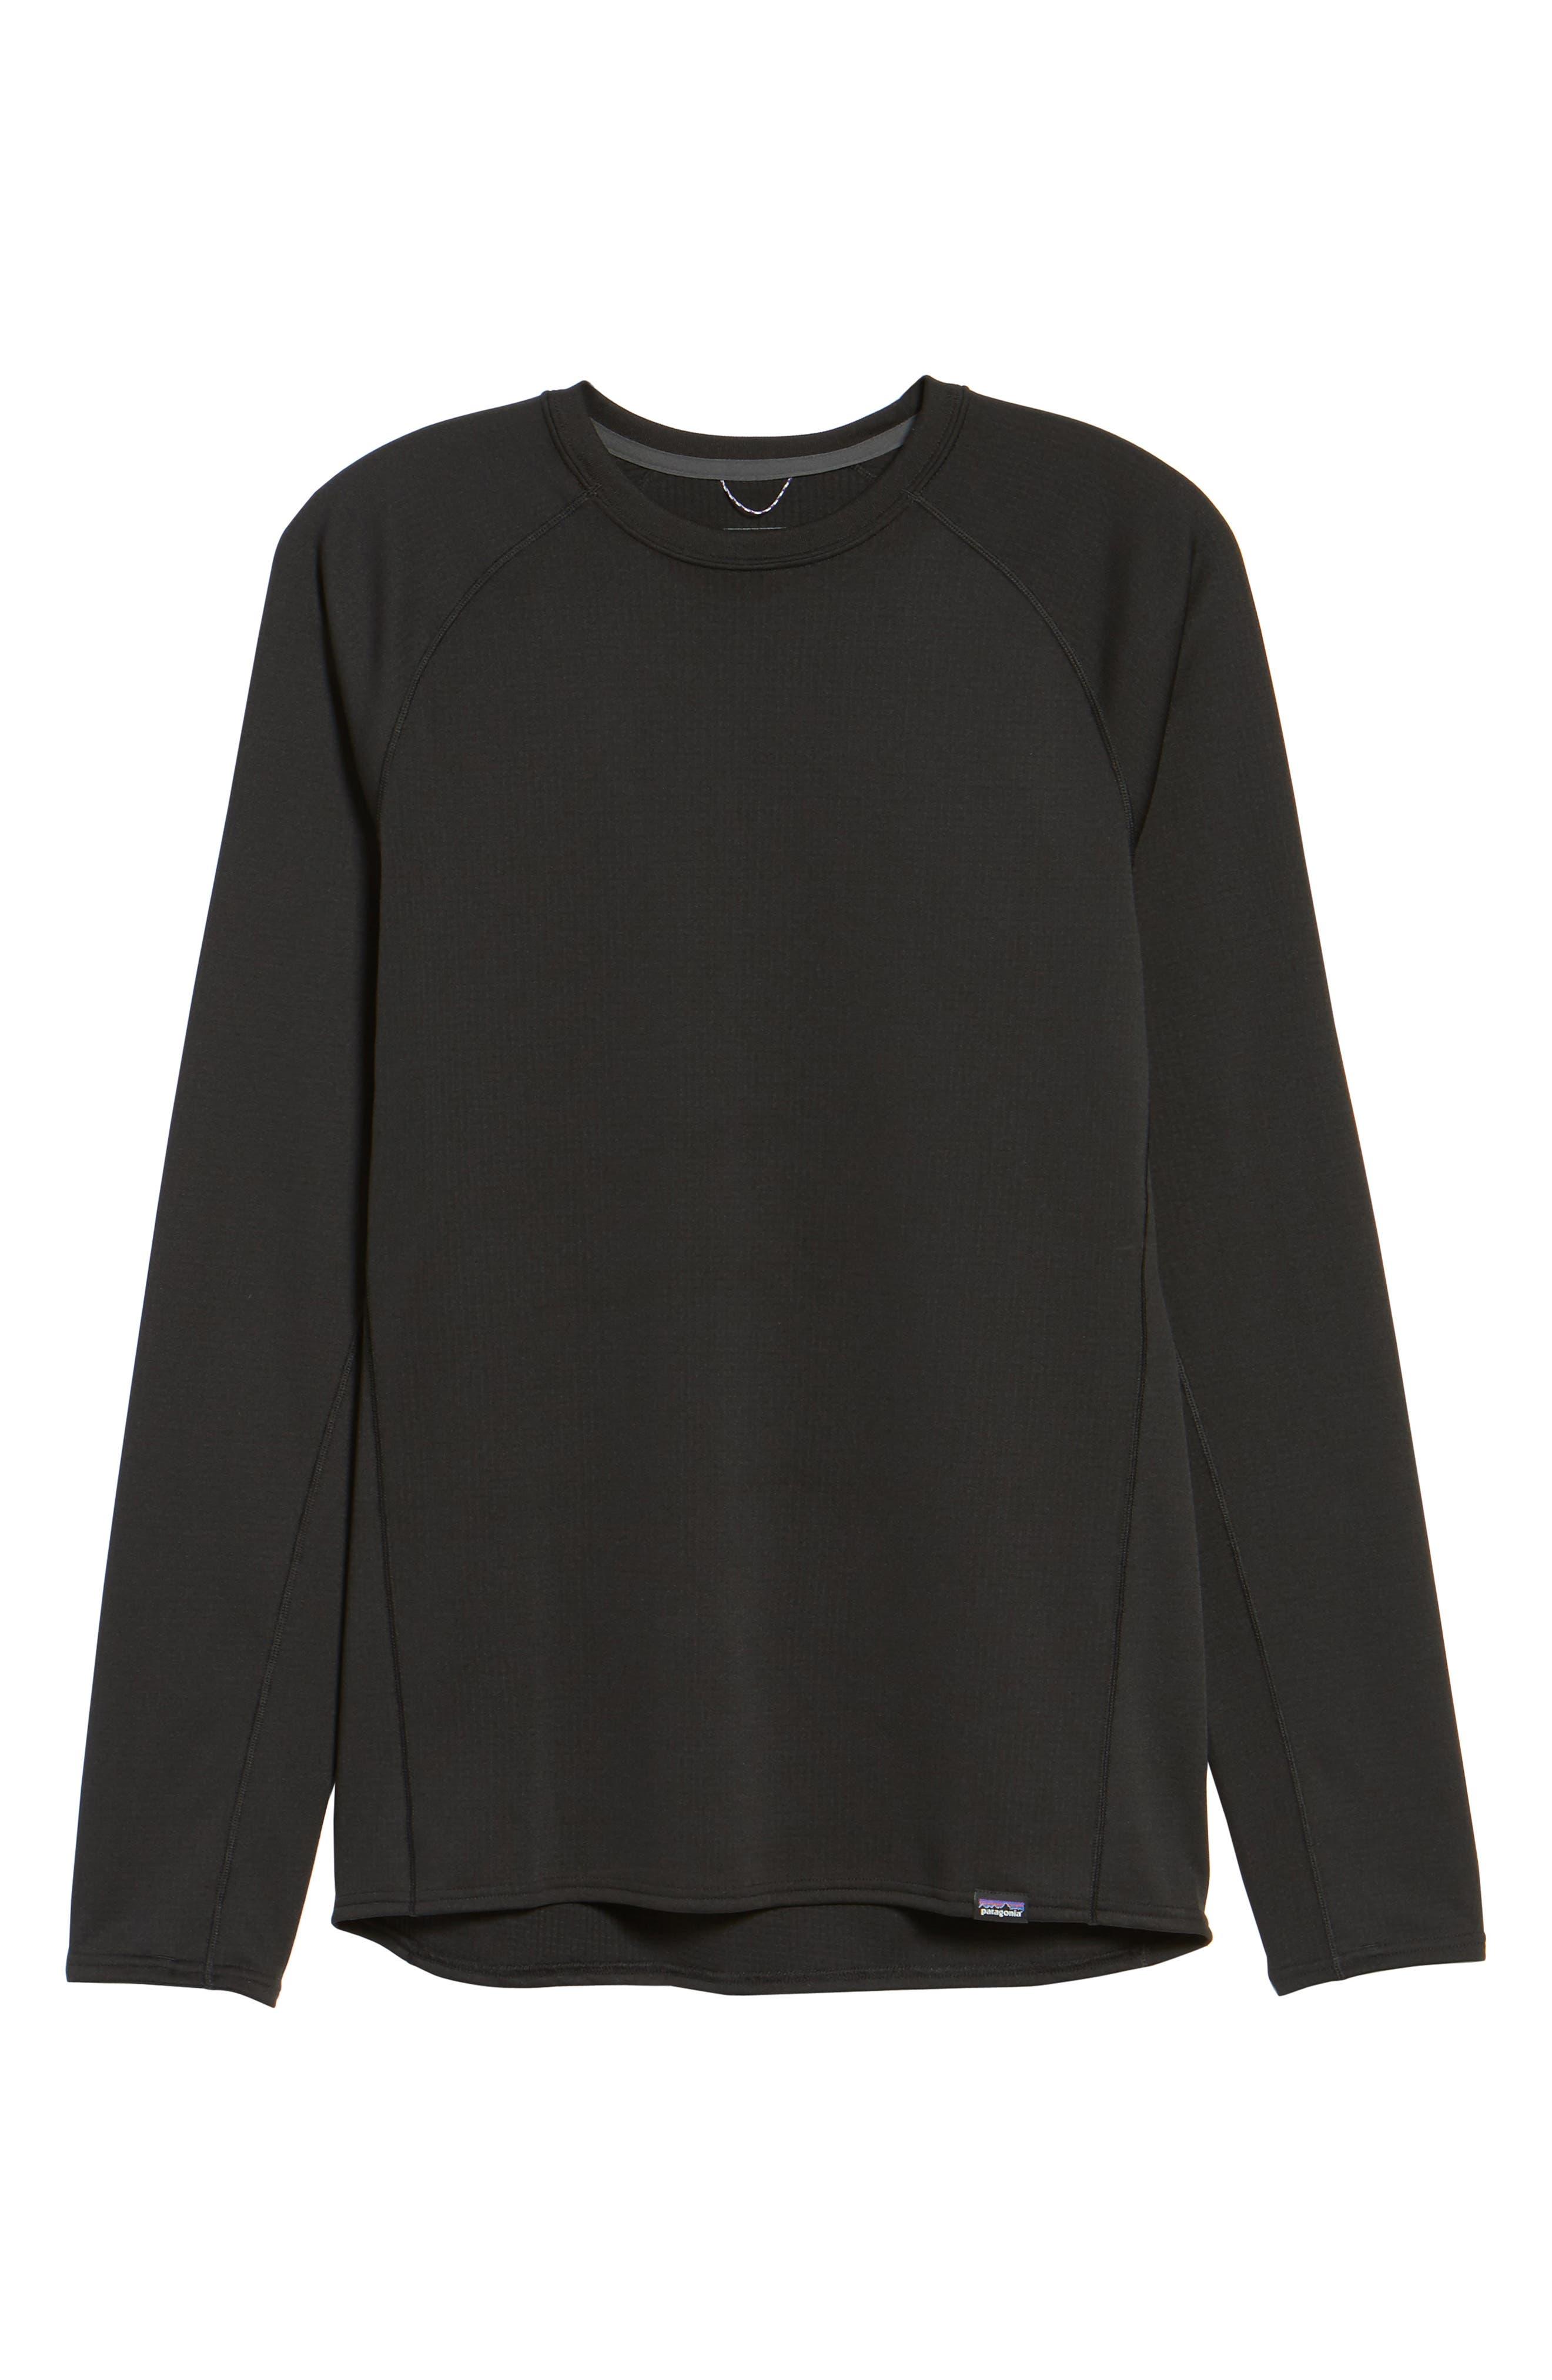 Capilene Midweight Base Layer T-Shirt,                             Alternate thumbnail 6, color,                             001